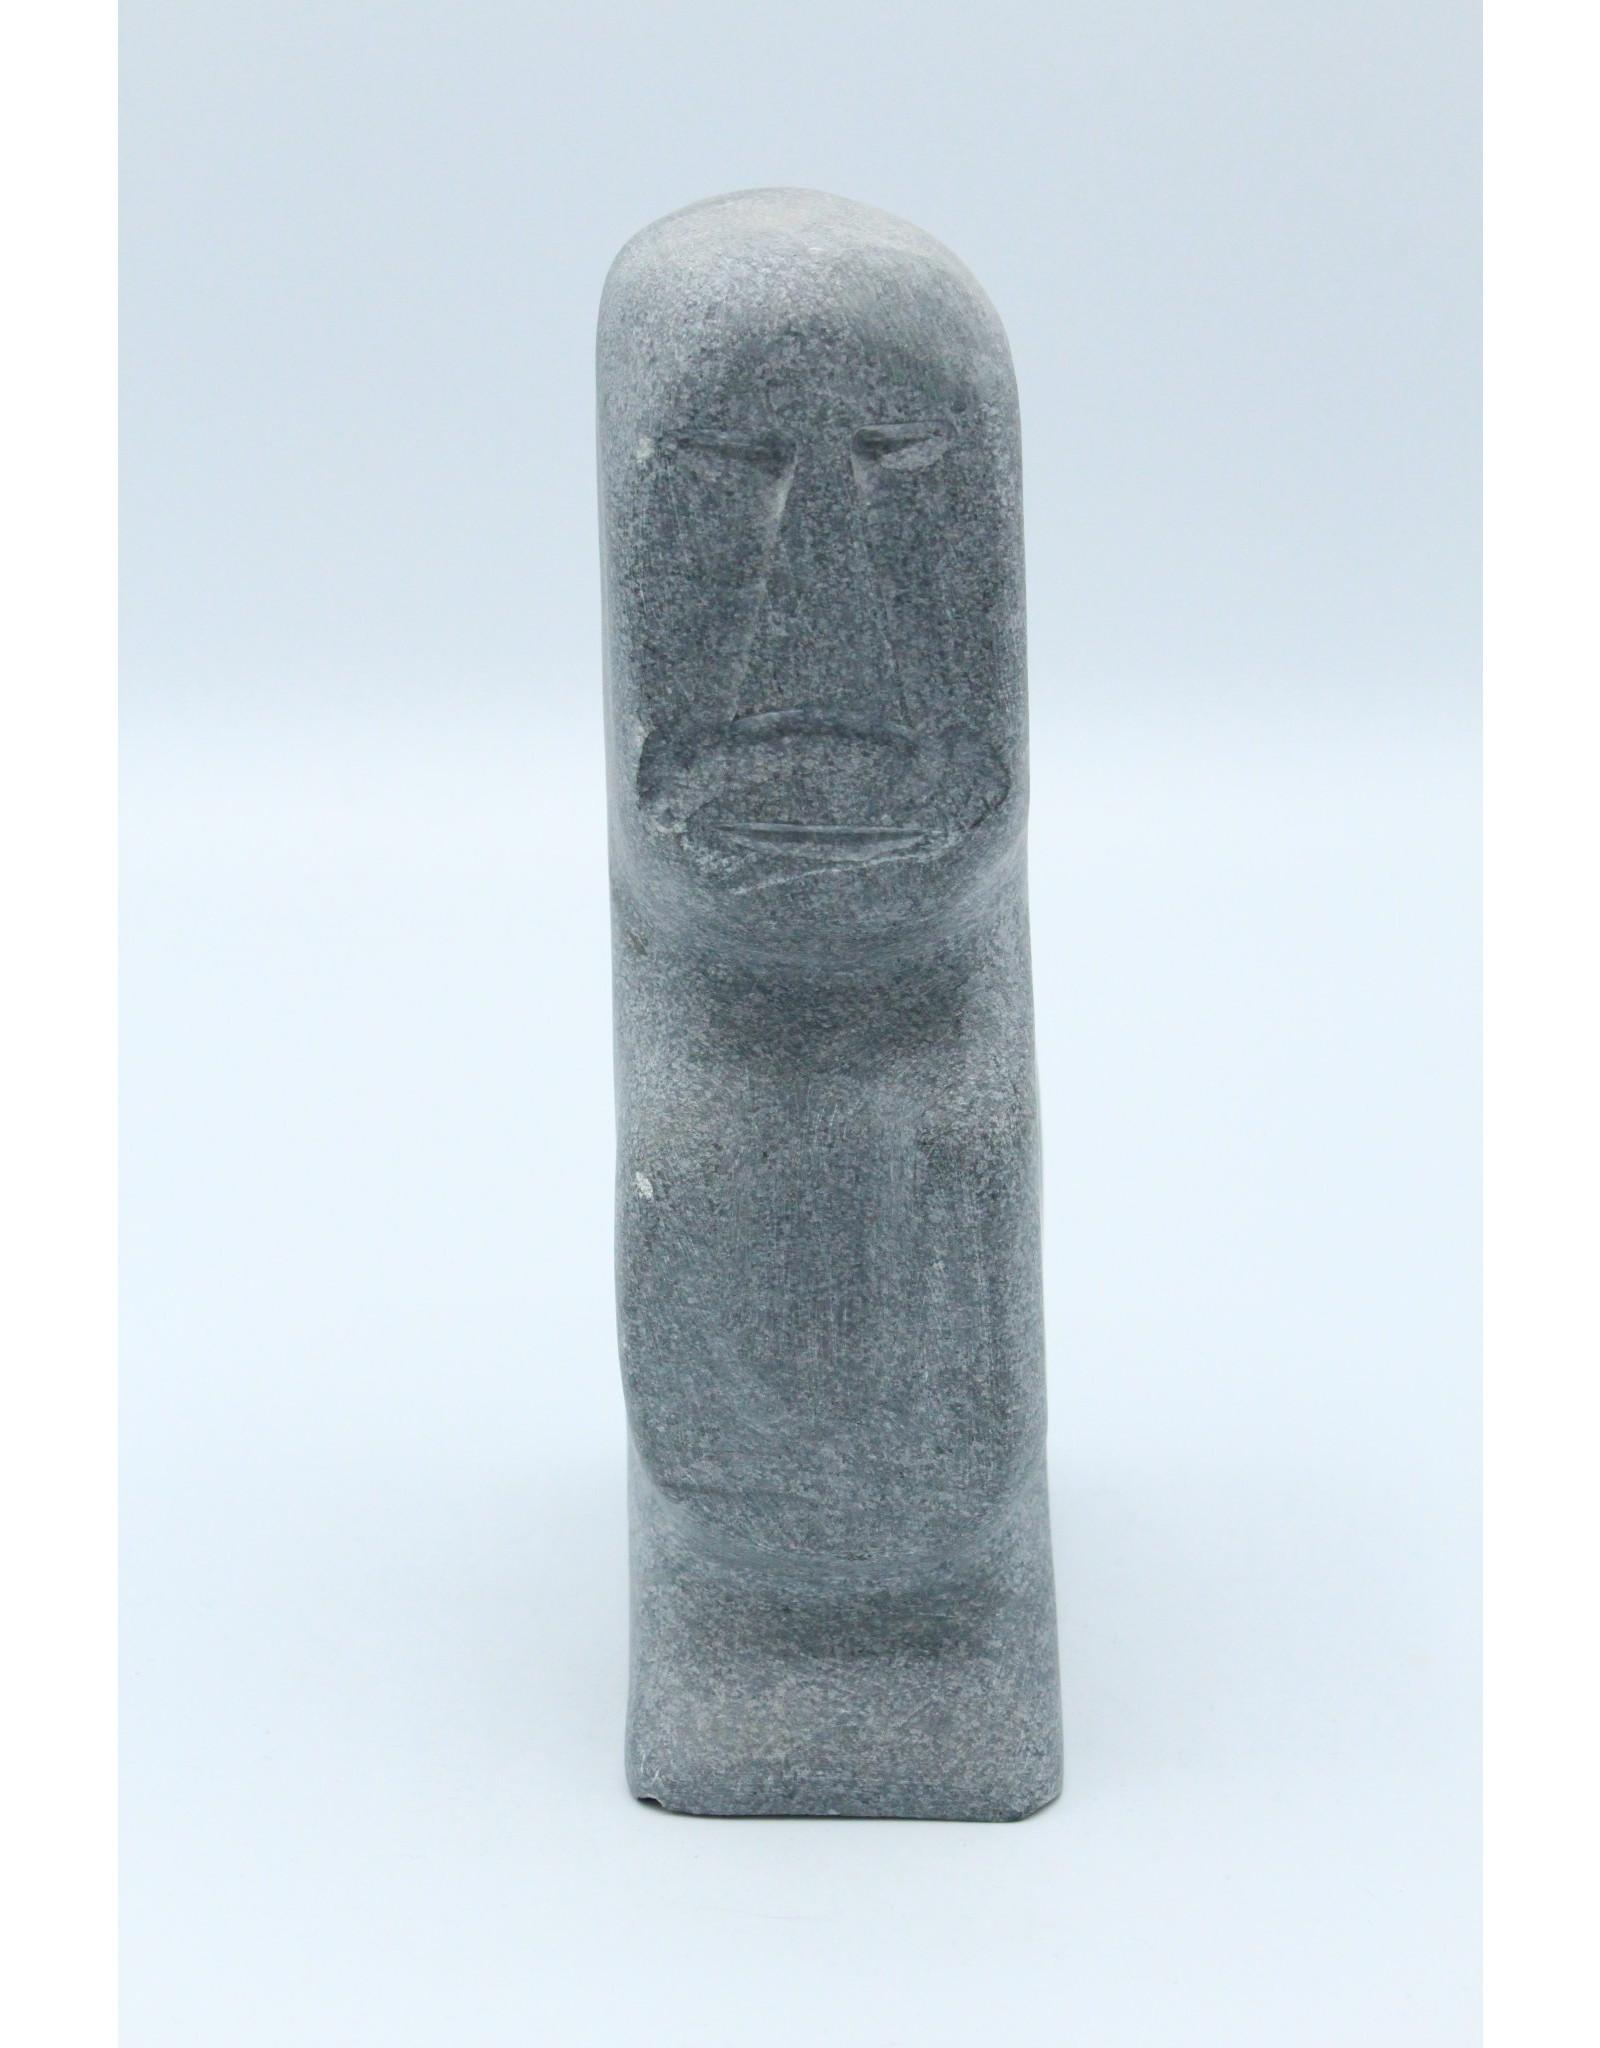 08160409 Faces by Robert Halluak